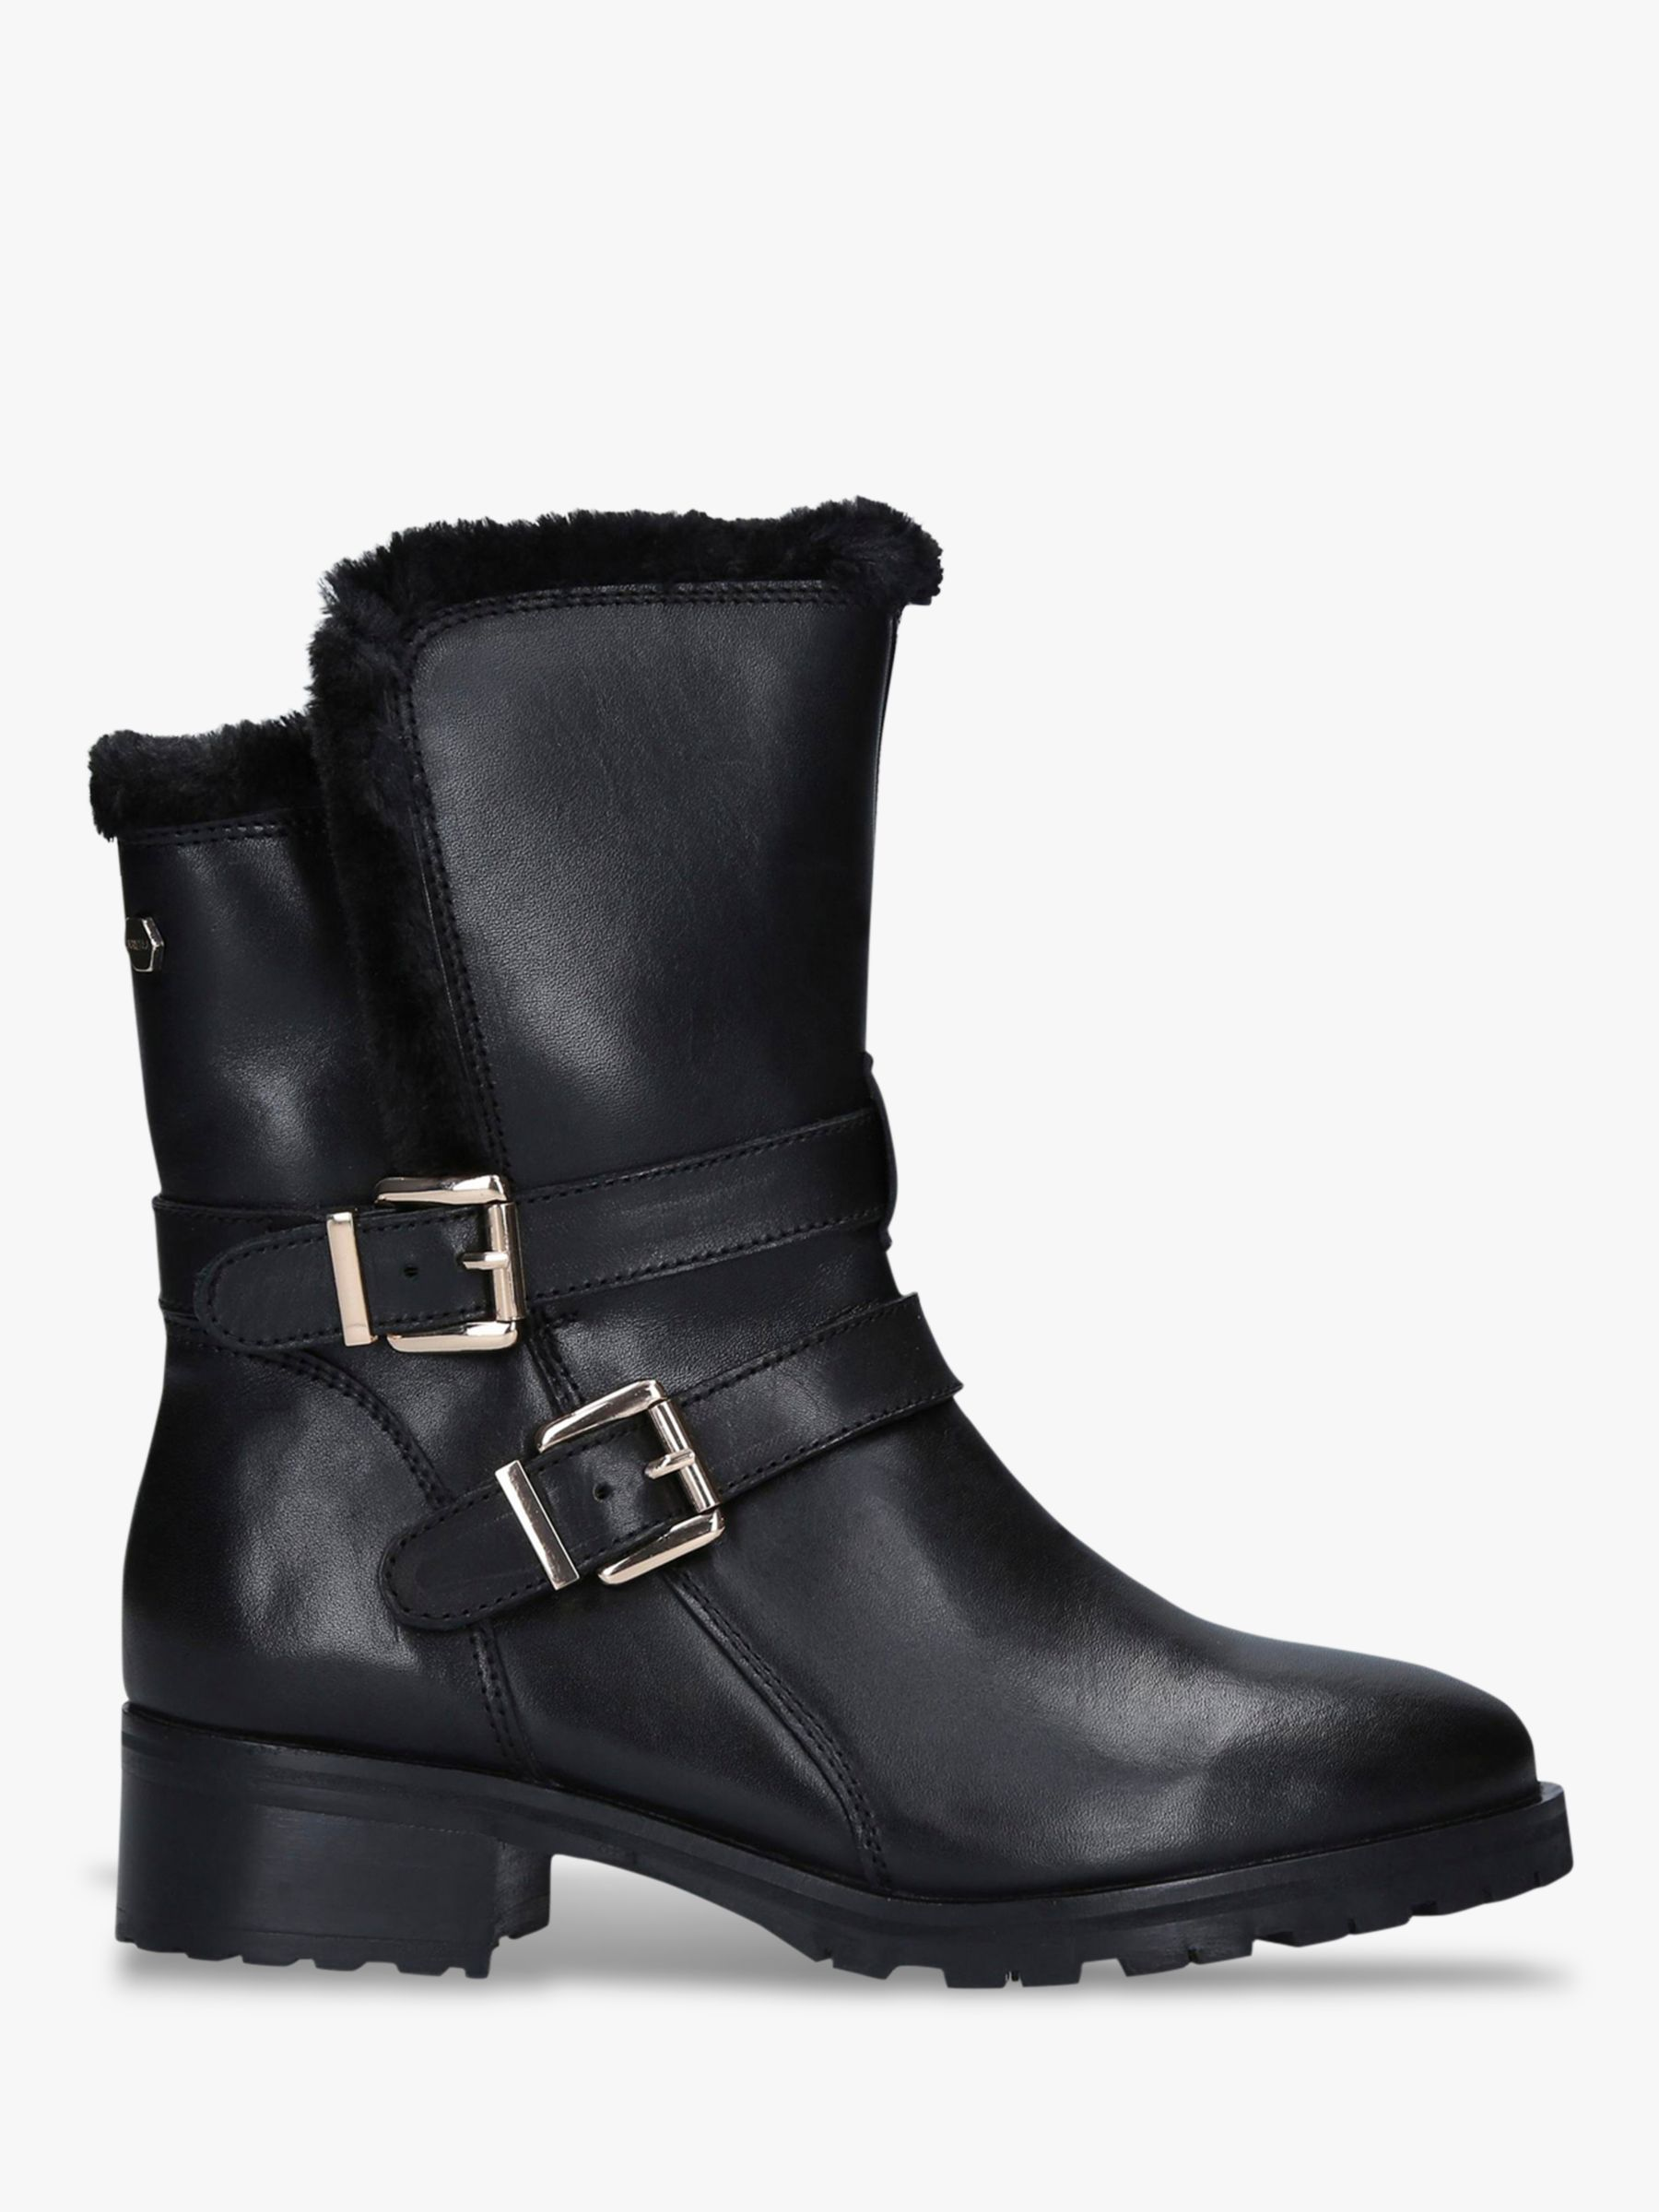 Carvela Comfort Carvela Comfort Roxi Buckle Detail Leather Ankle Boots, Black